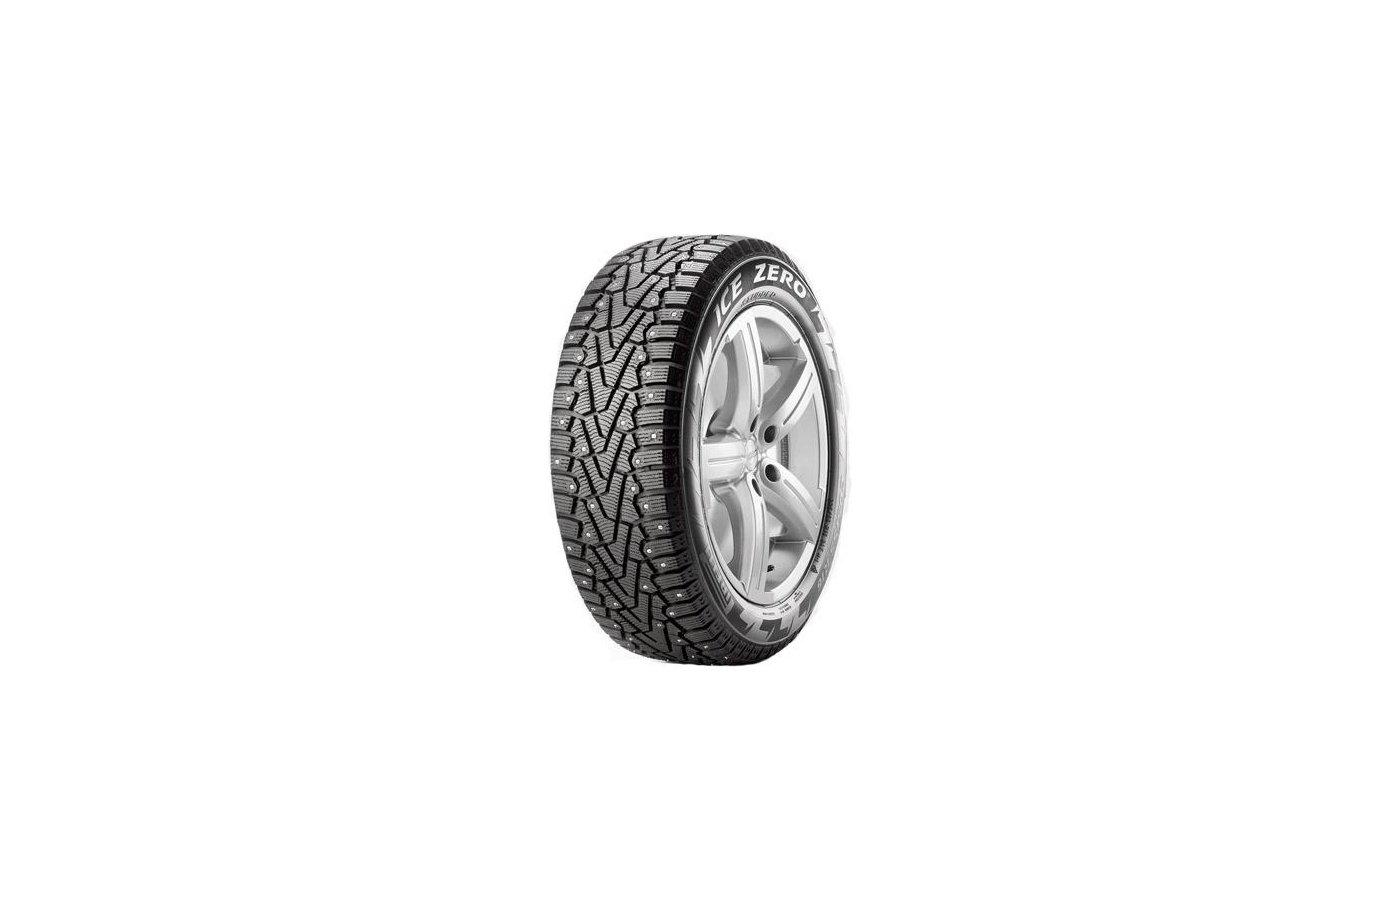 Шина Pirelli Winter Ice Zero 185/65 R15 TL 92T XL шип